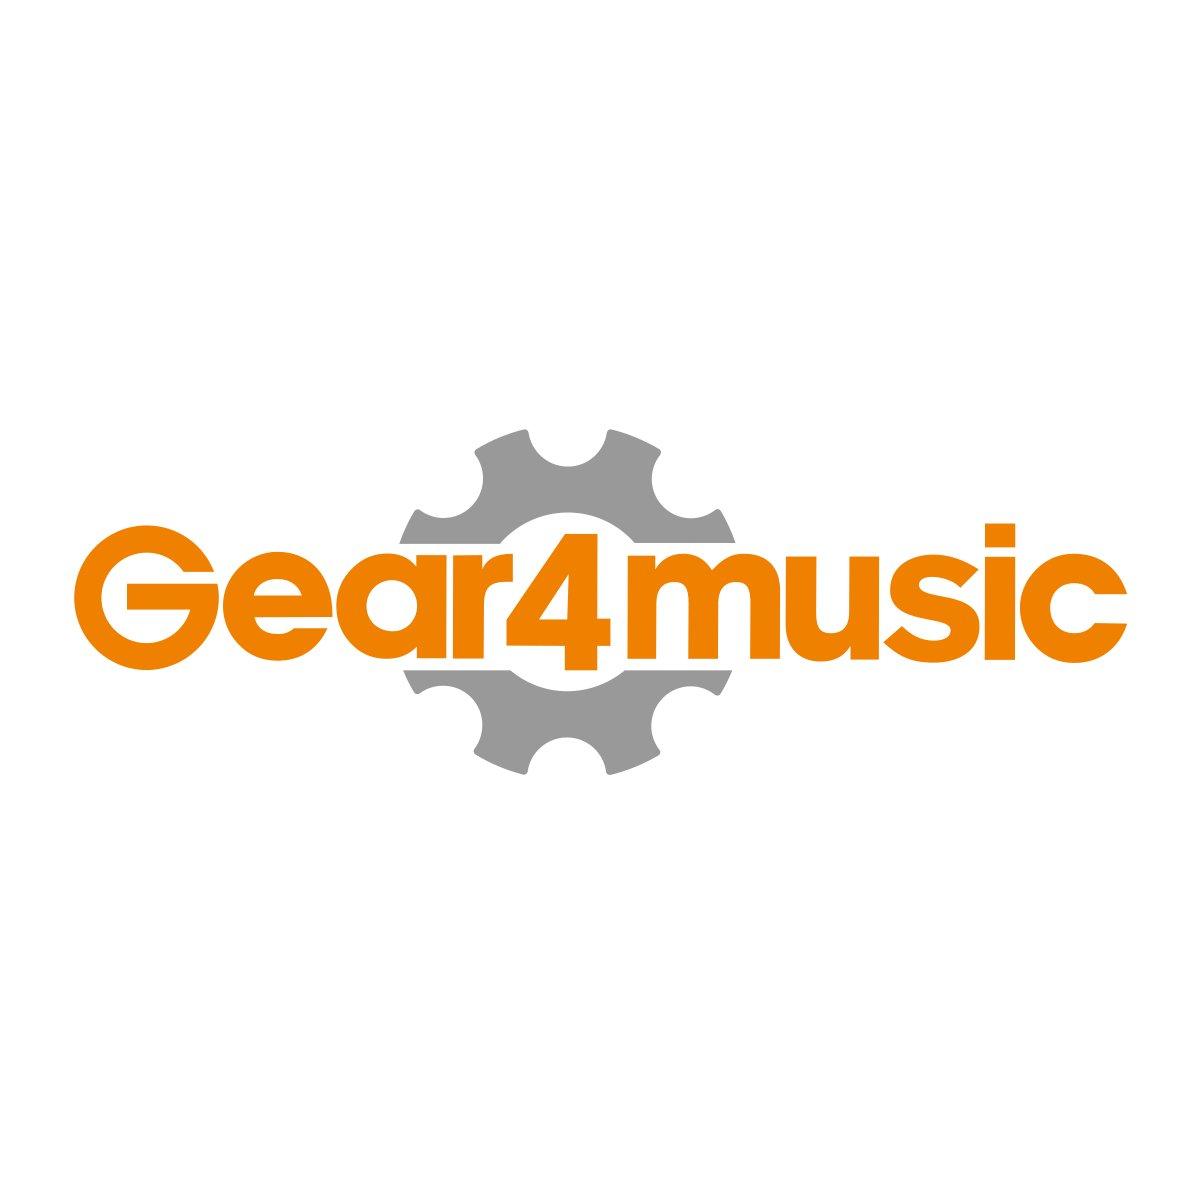 dunlop dvp4 volume x mini pedal at gear4music. Black Bedroom Furniture Sets. Home Design Ideas